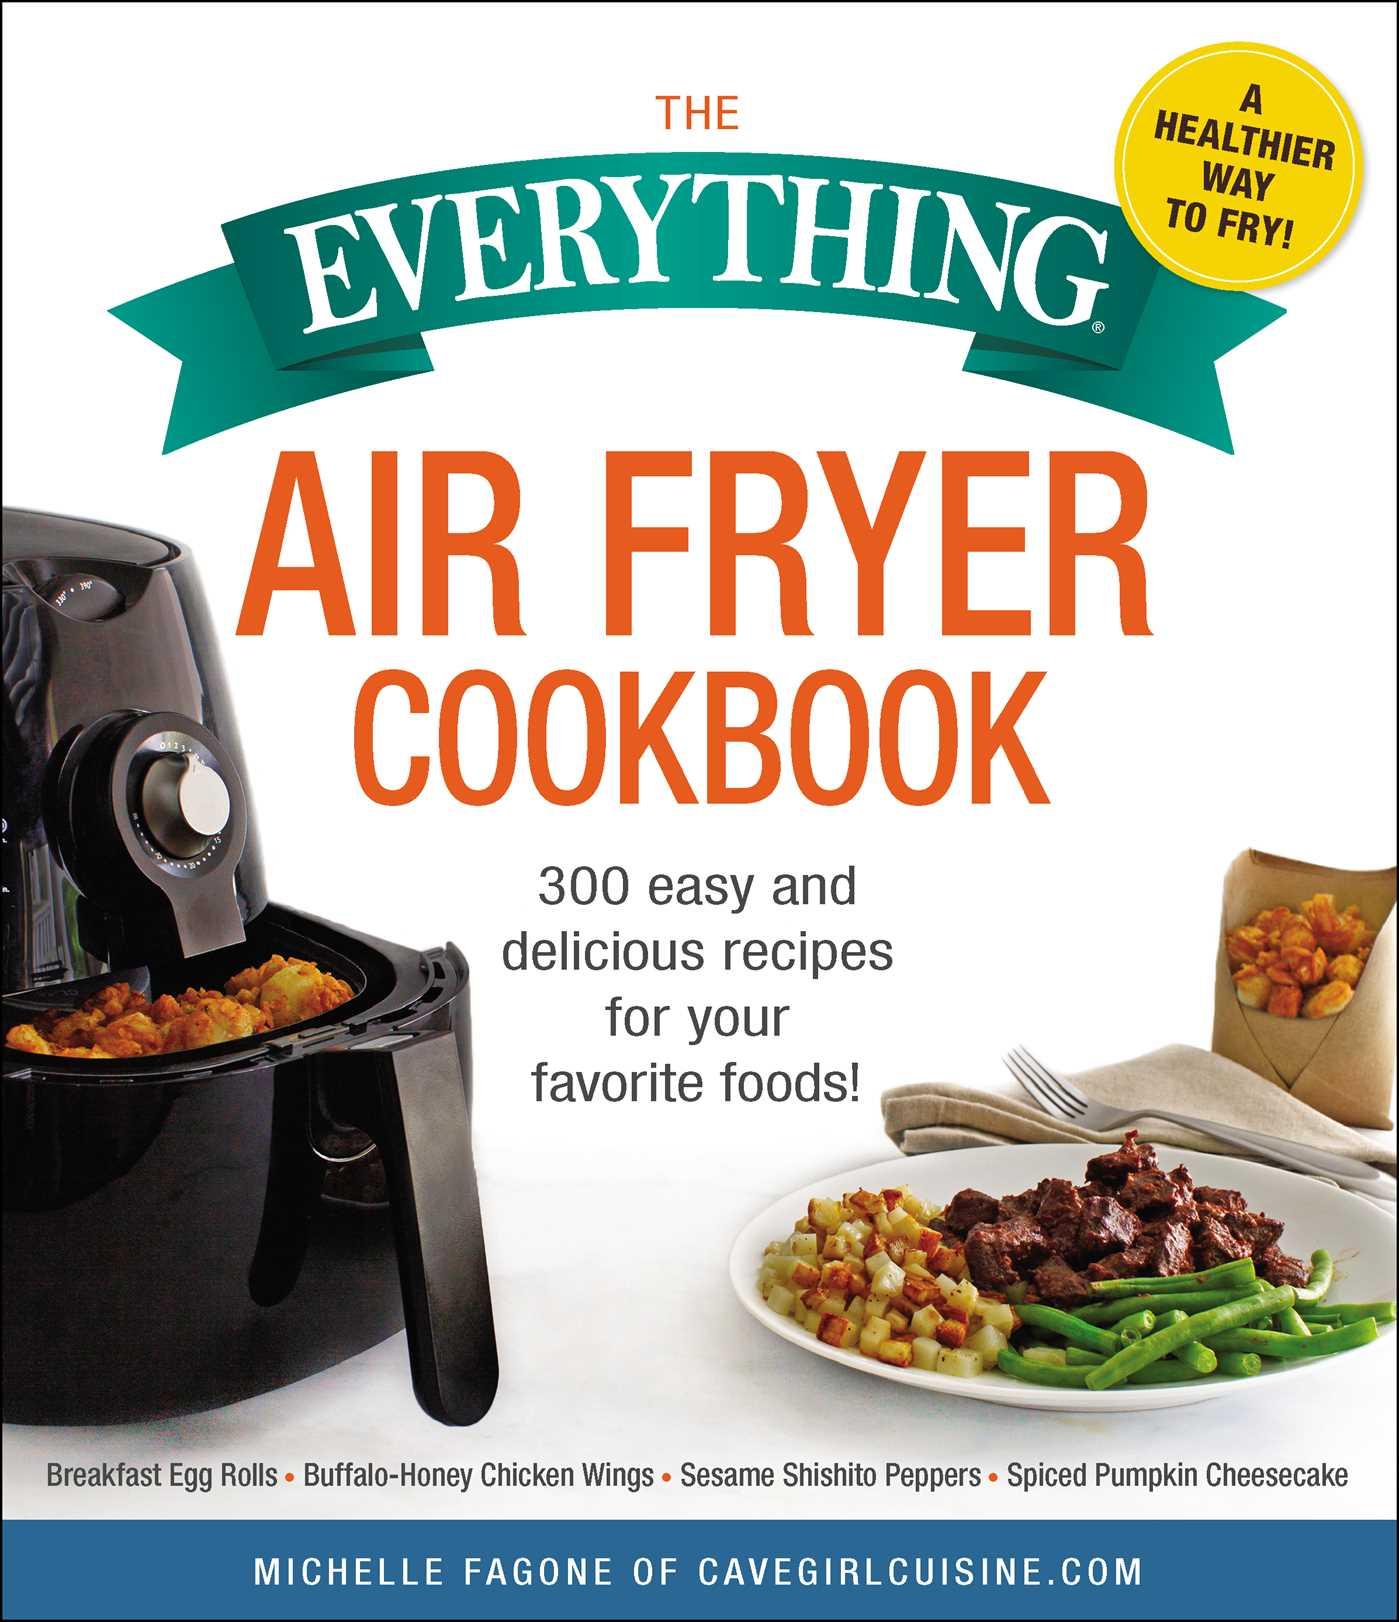 The everything air fryer cookbook 9781507209134 hr